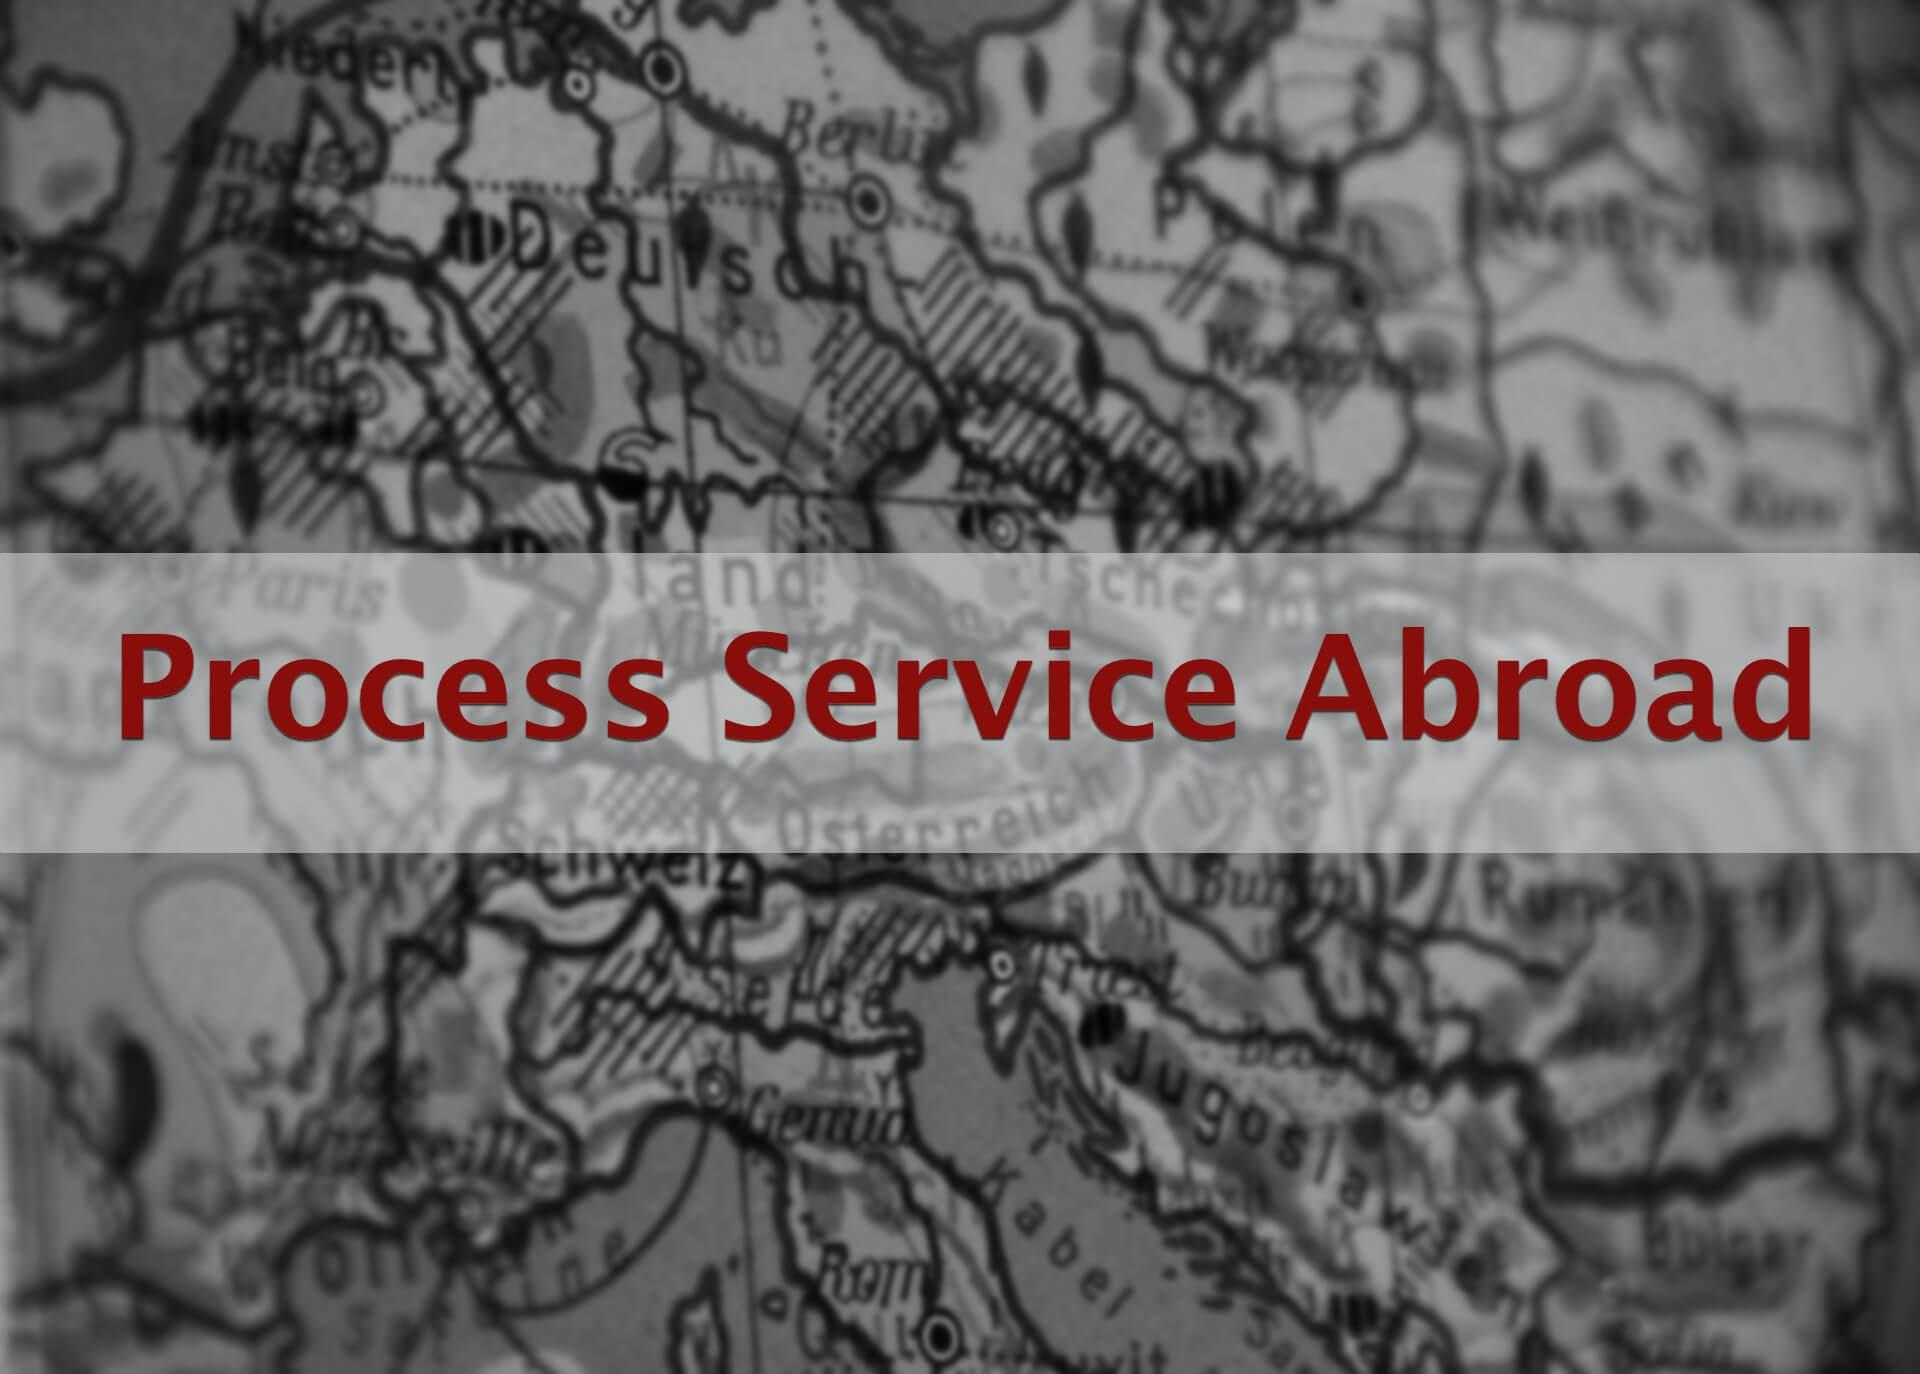 Process Service Abroad